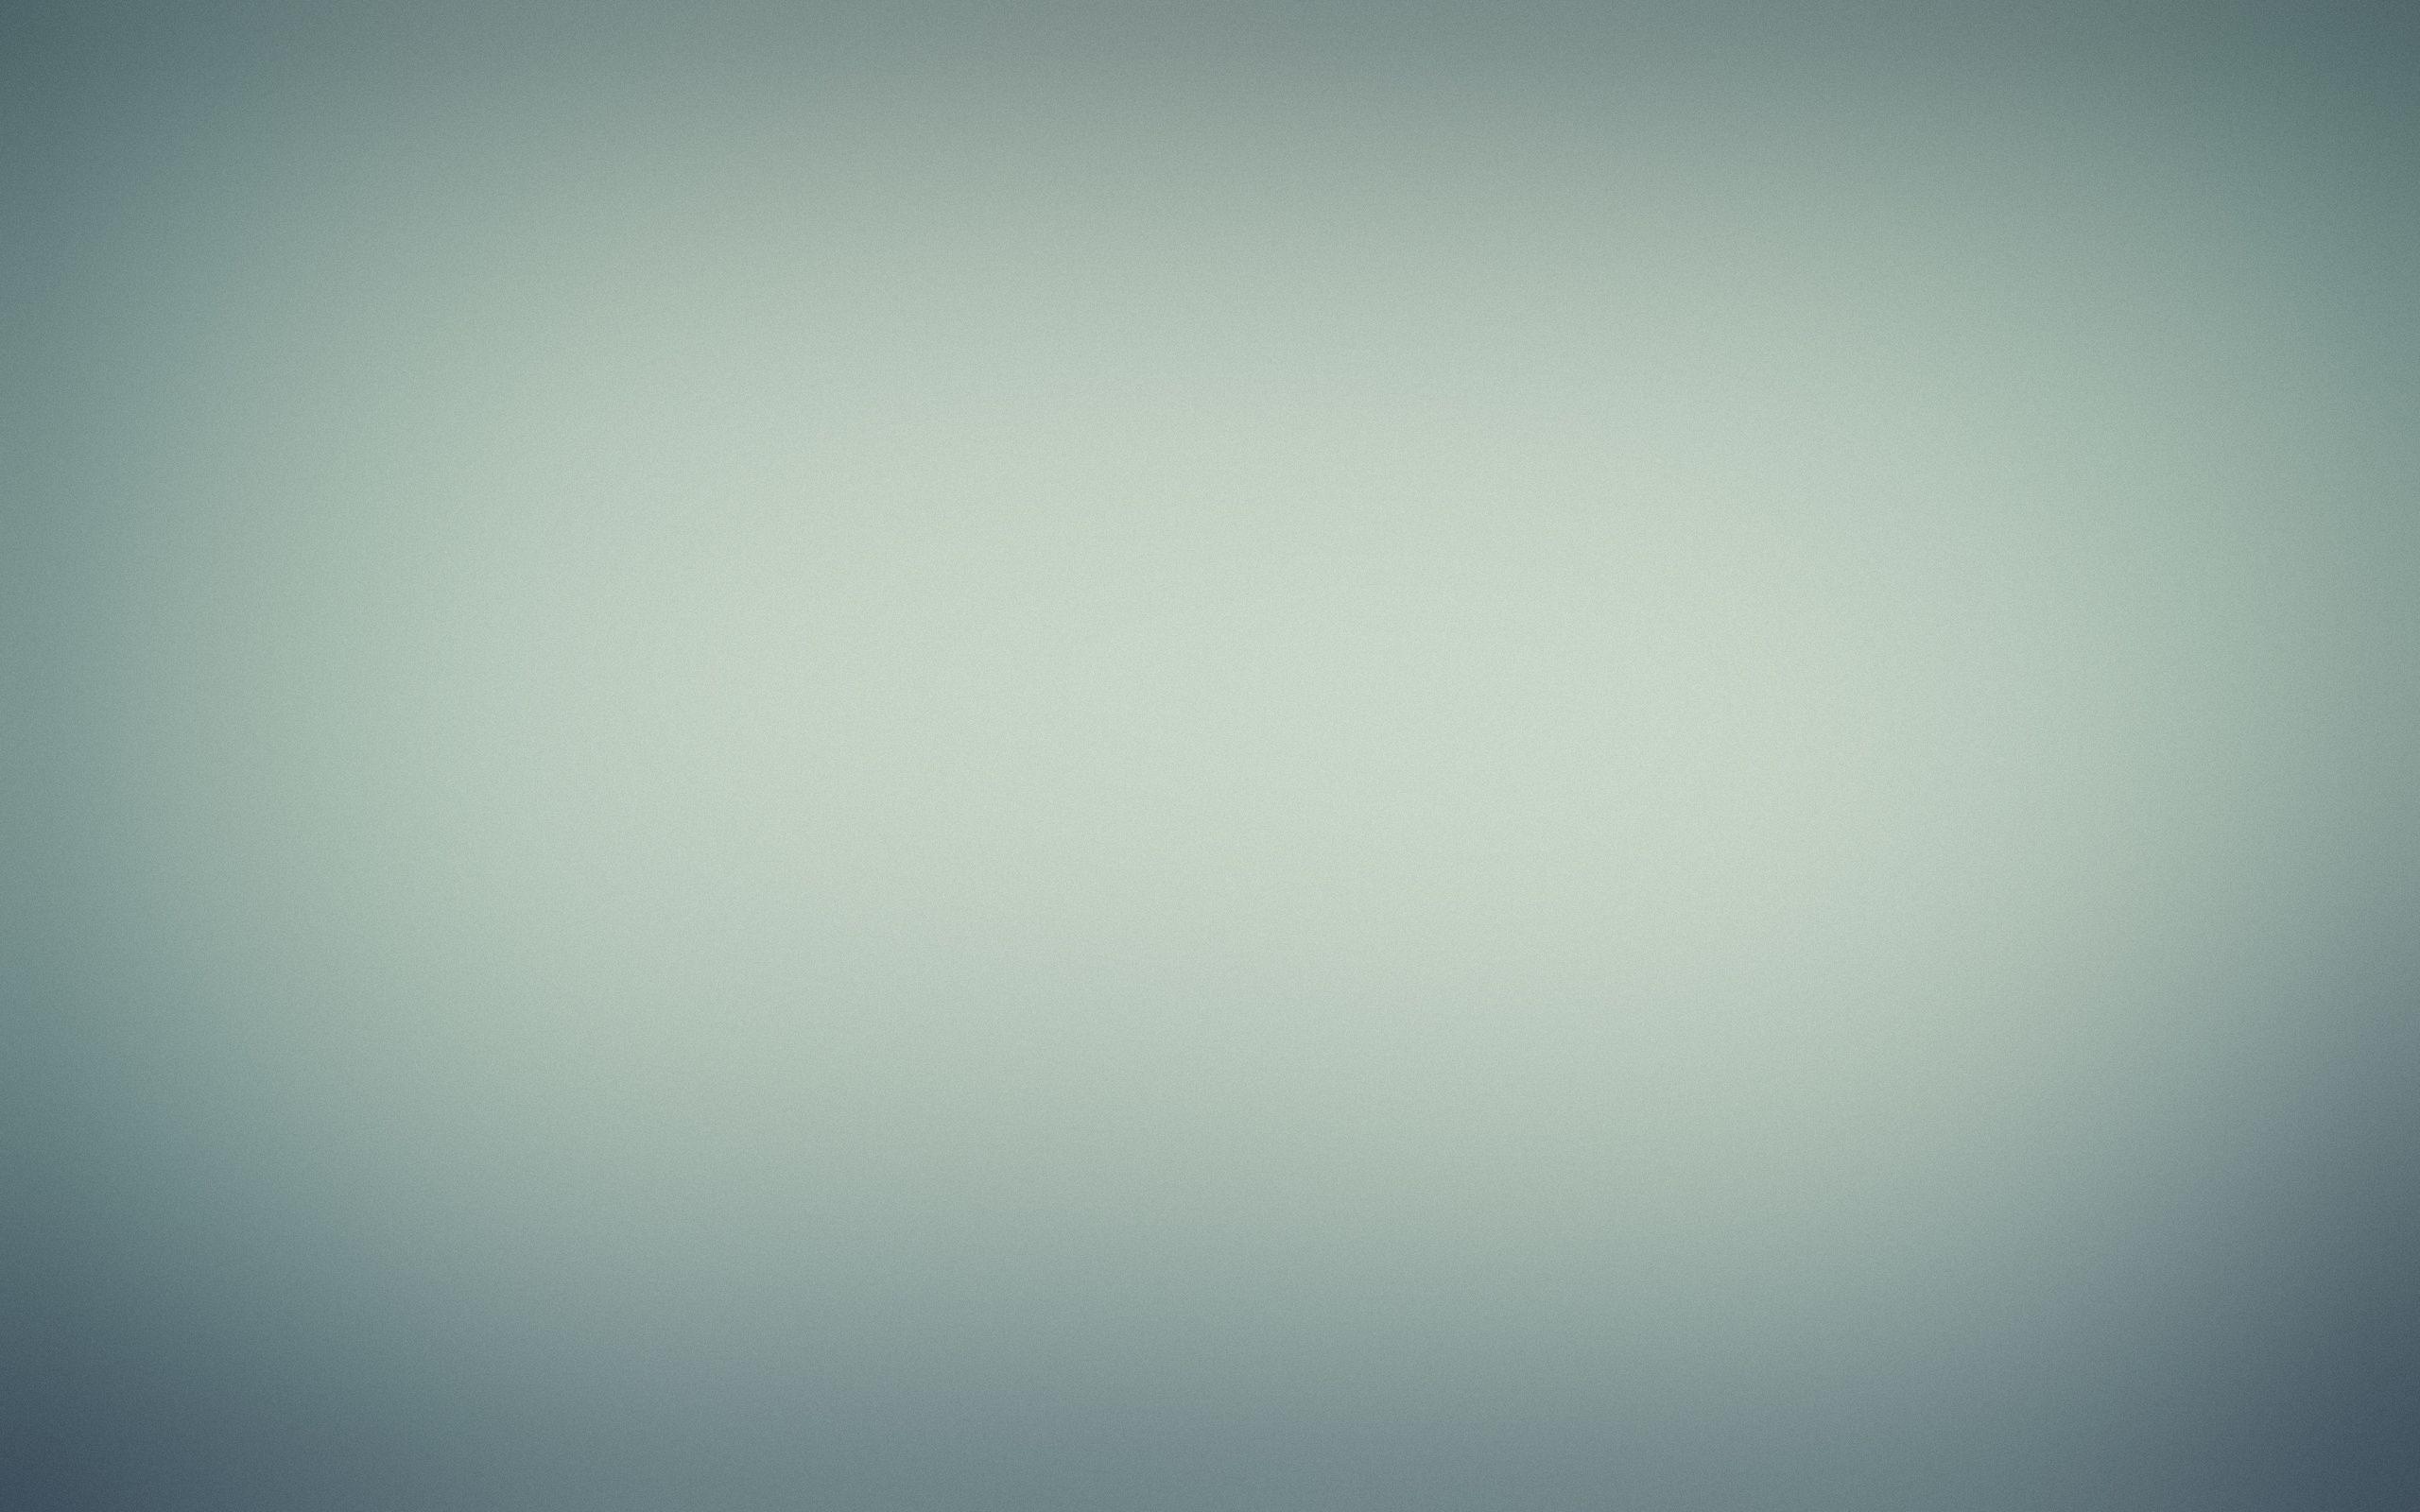 gradients, backgrounds | gradients, backgrounds | Pinterest